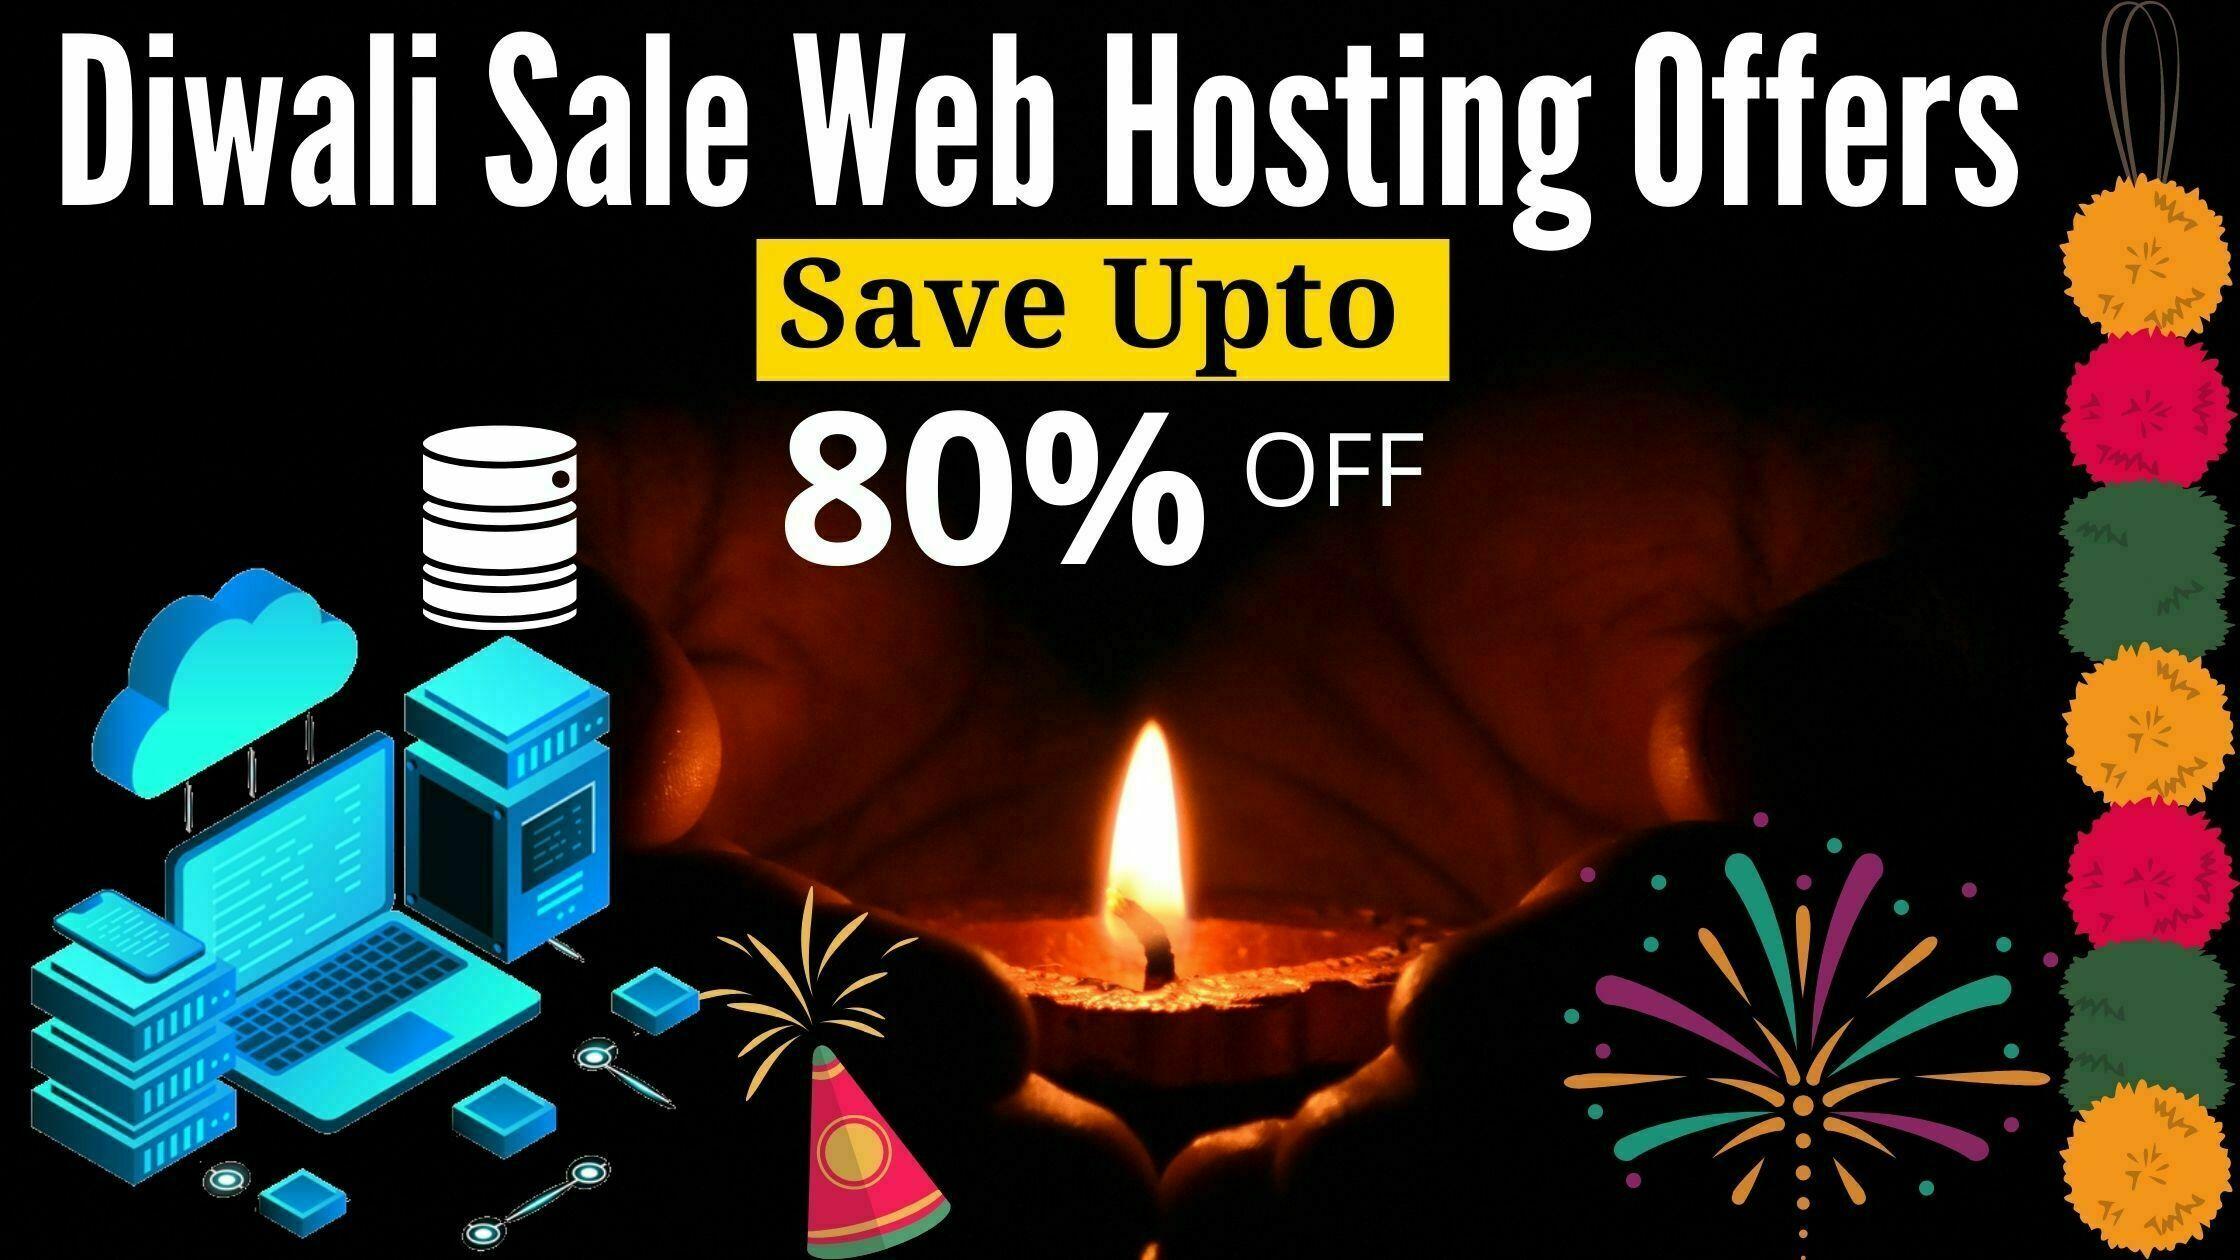 Diwali Sale Web Hosting Offers upto 80% off